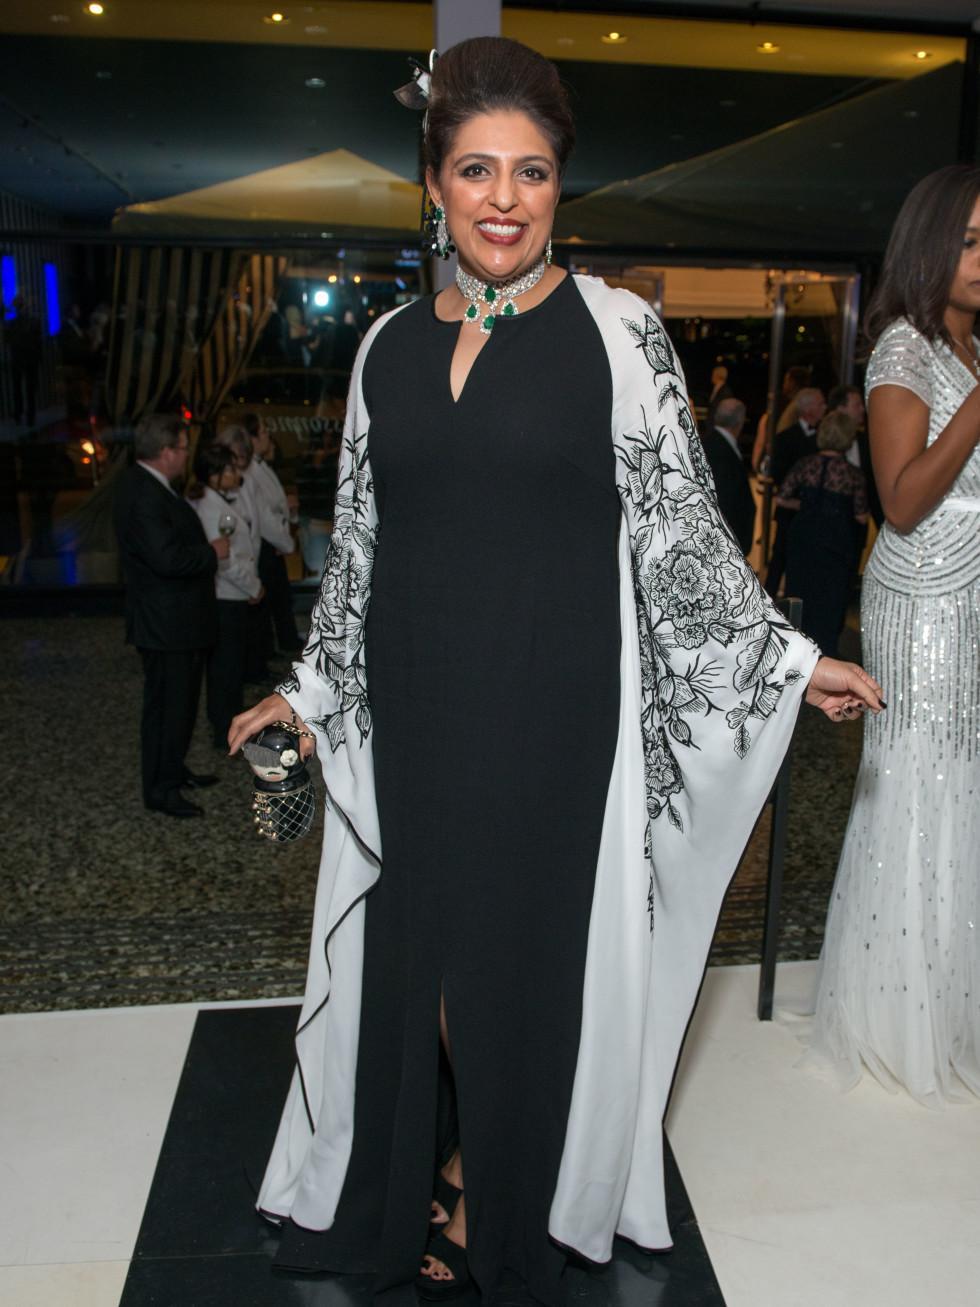 News, Shelby, MFAH gala gowns, Oct. 2015 Nidhika Mehta in Naeem Khan